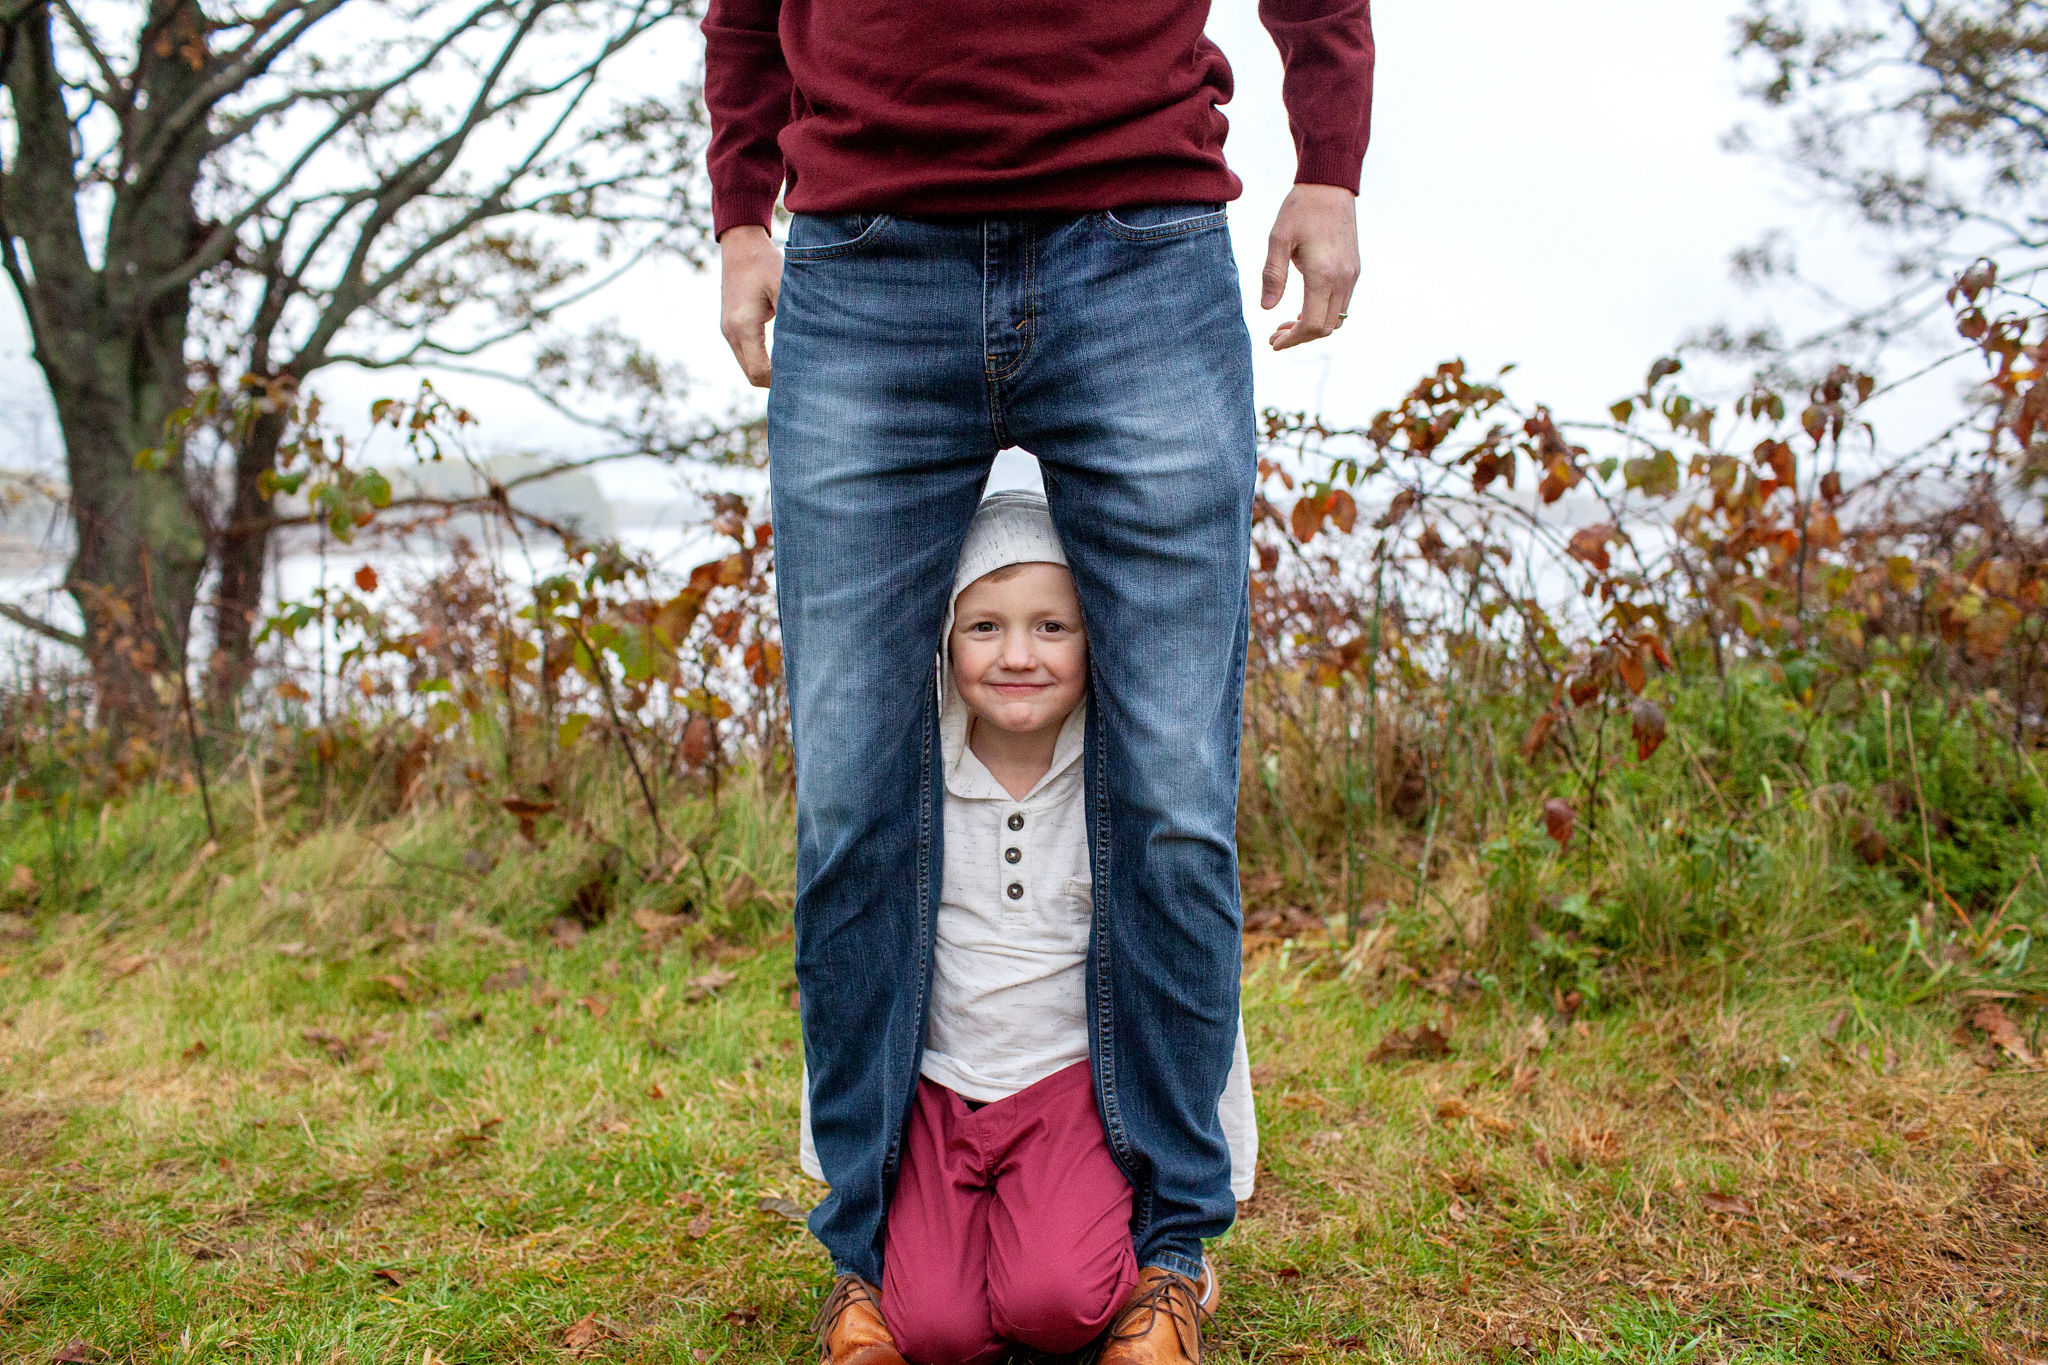 maine-family-photography-stepheneycollins -49.jpg